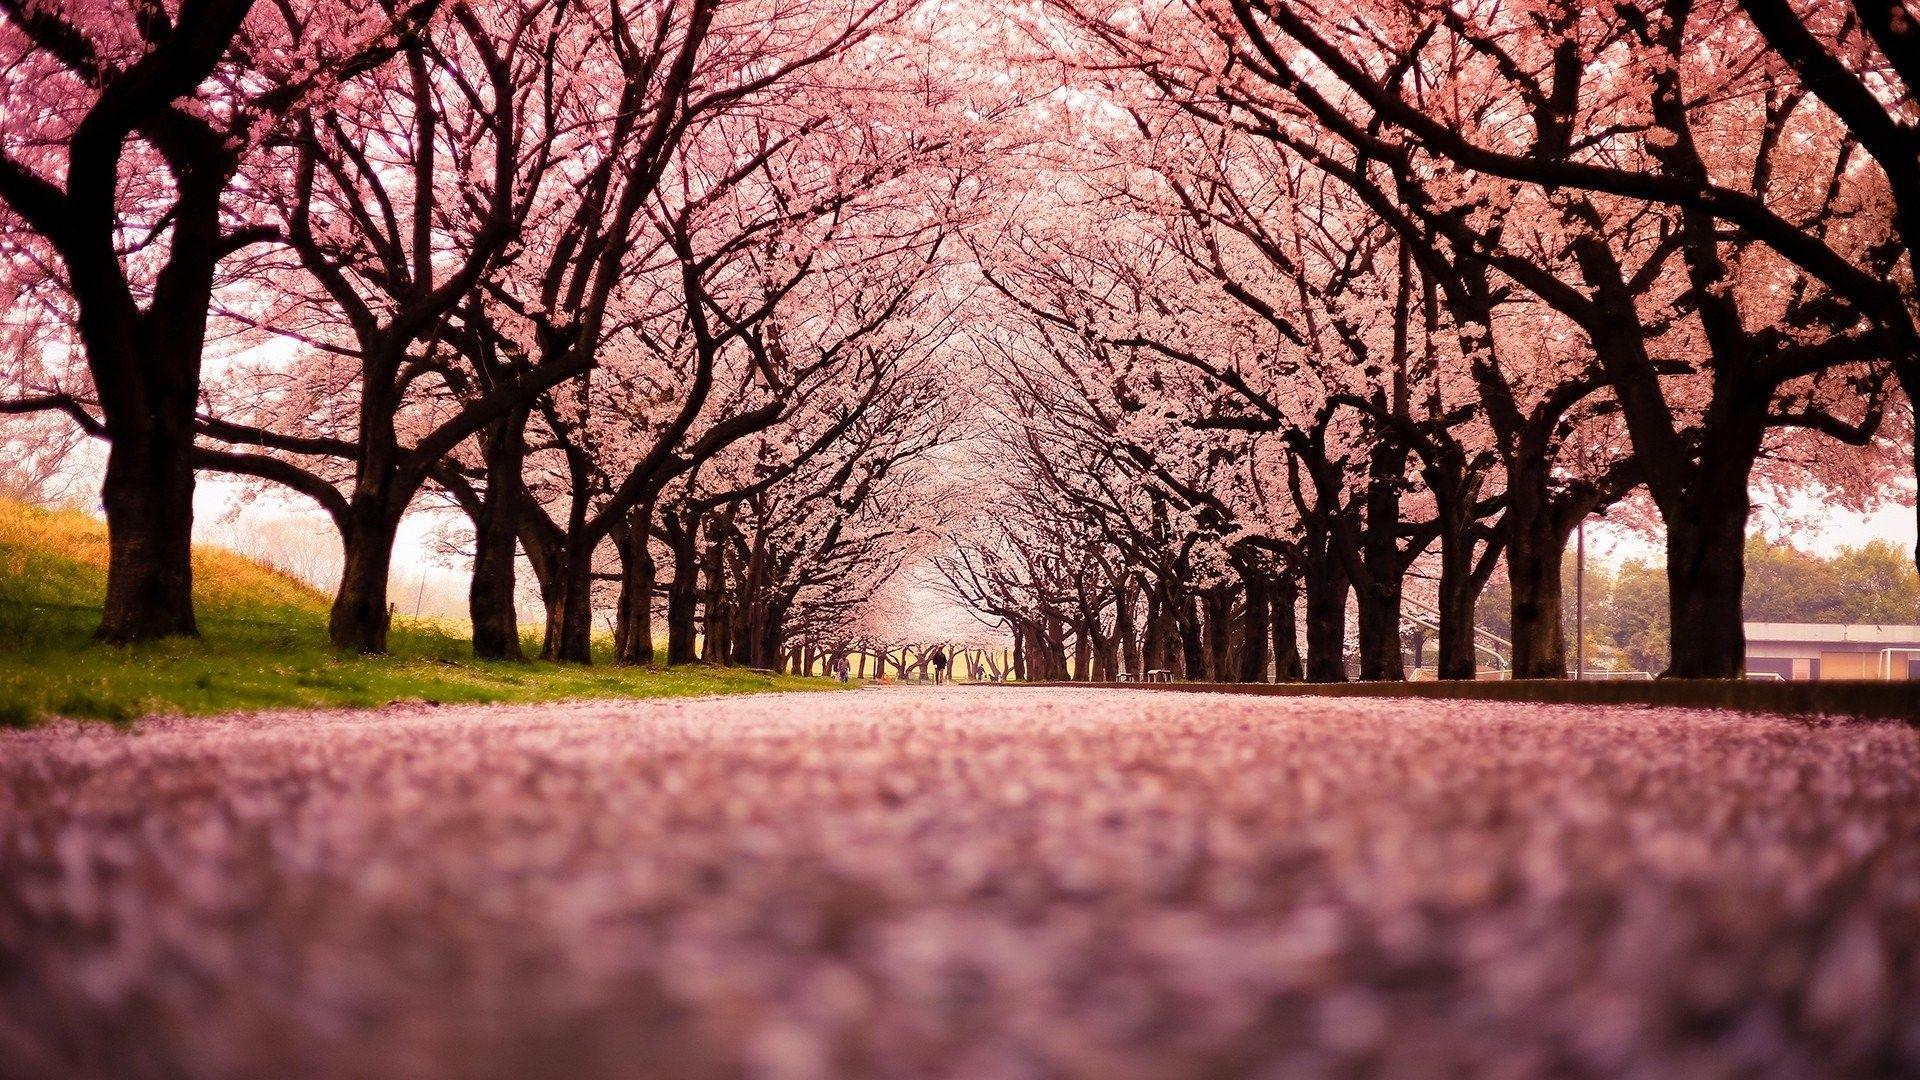 Japanese Hd Desktop Wallpapers Top Free Japanese Hd Desktop Backgrounds Wallpaperaccess